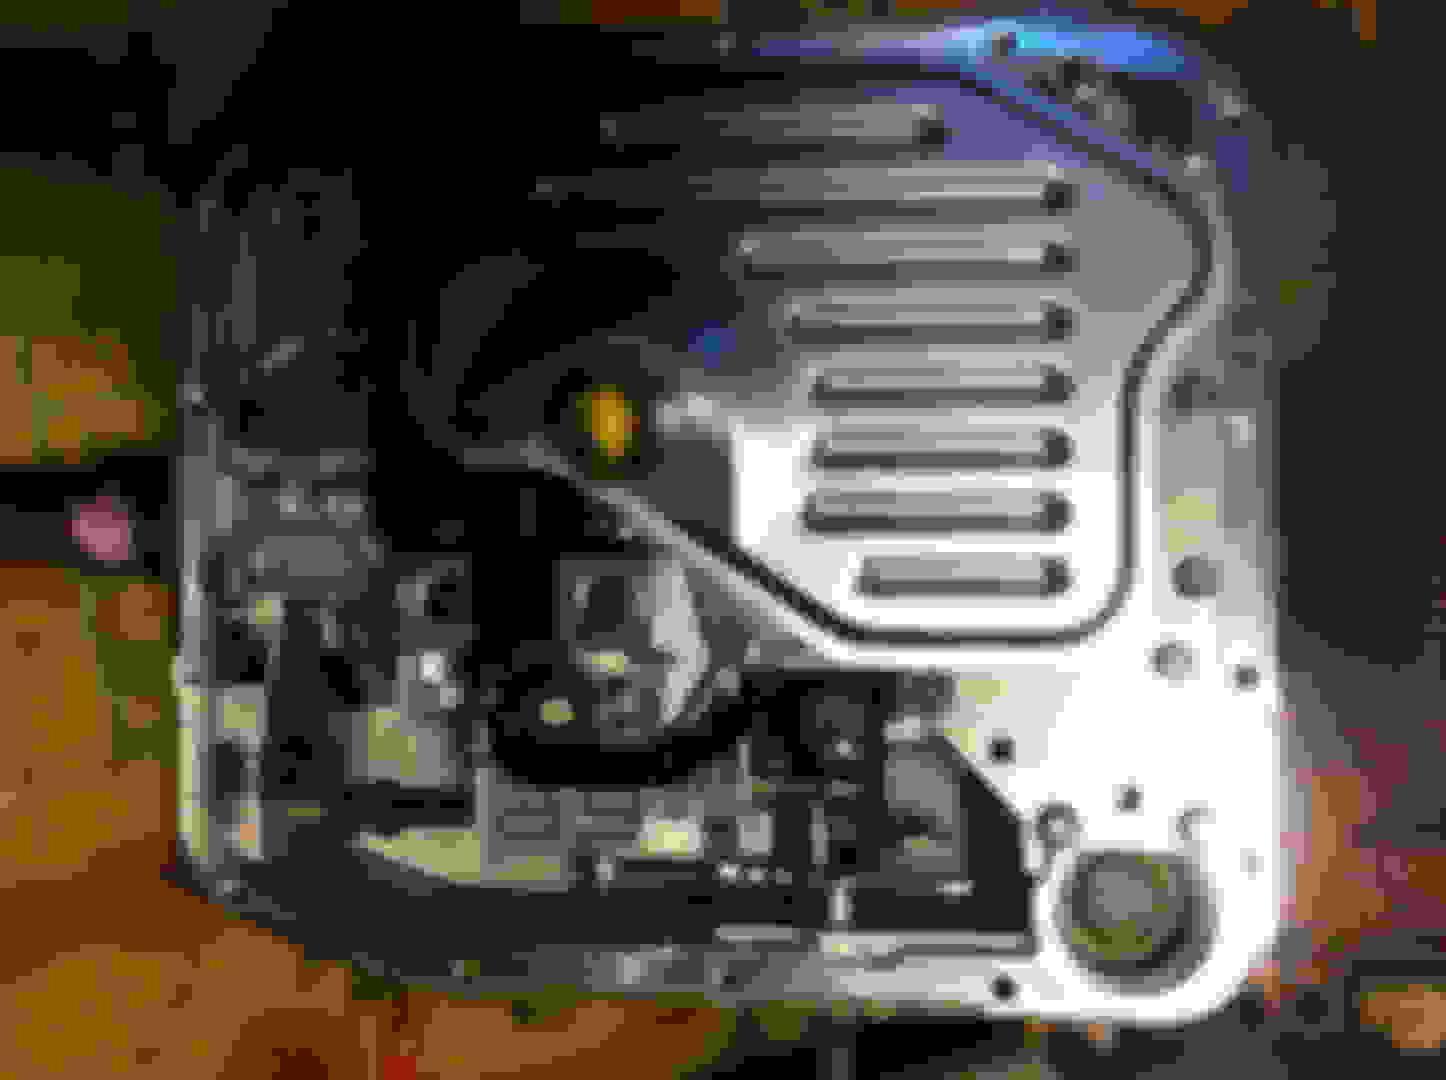 4R75W '04 F150 XLT 4 6L: Flashing OD & Trans Fault